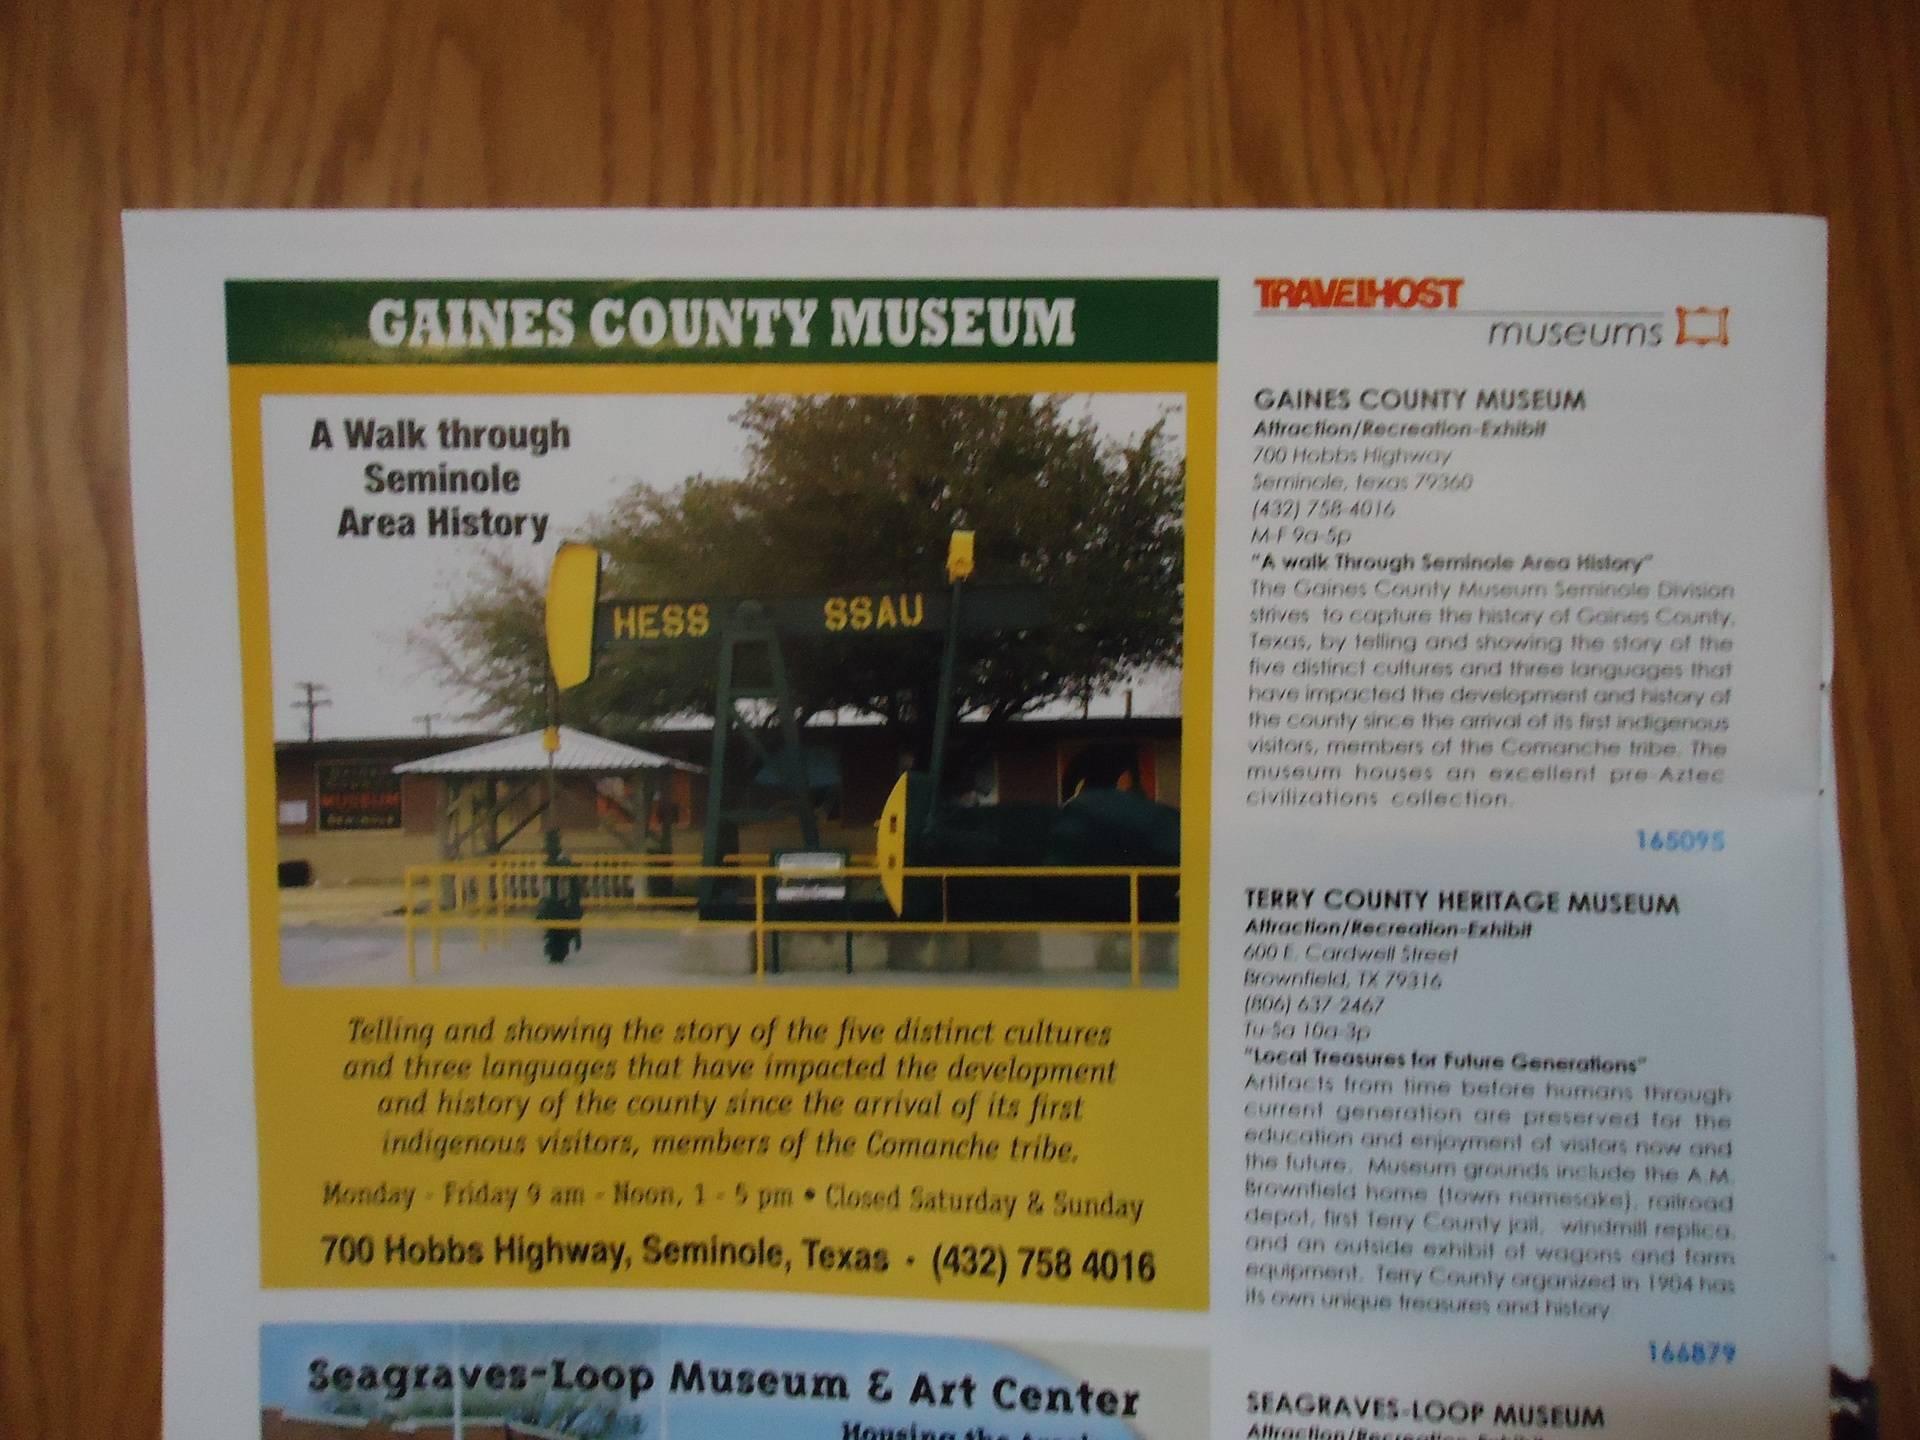 Museum featured in TravelHost Magazine